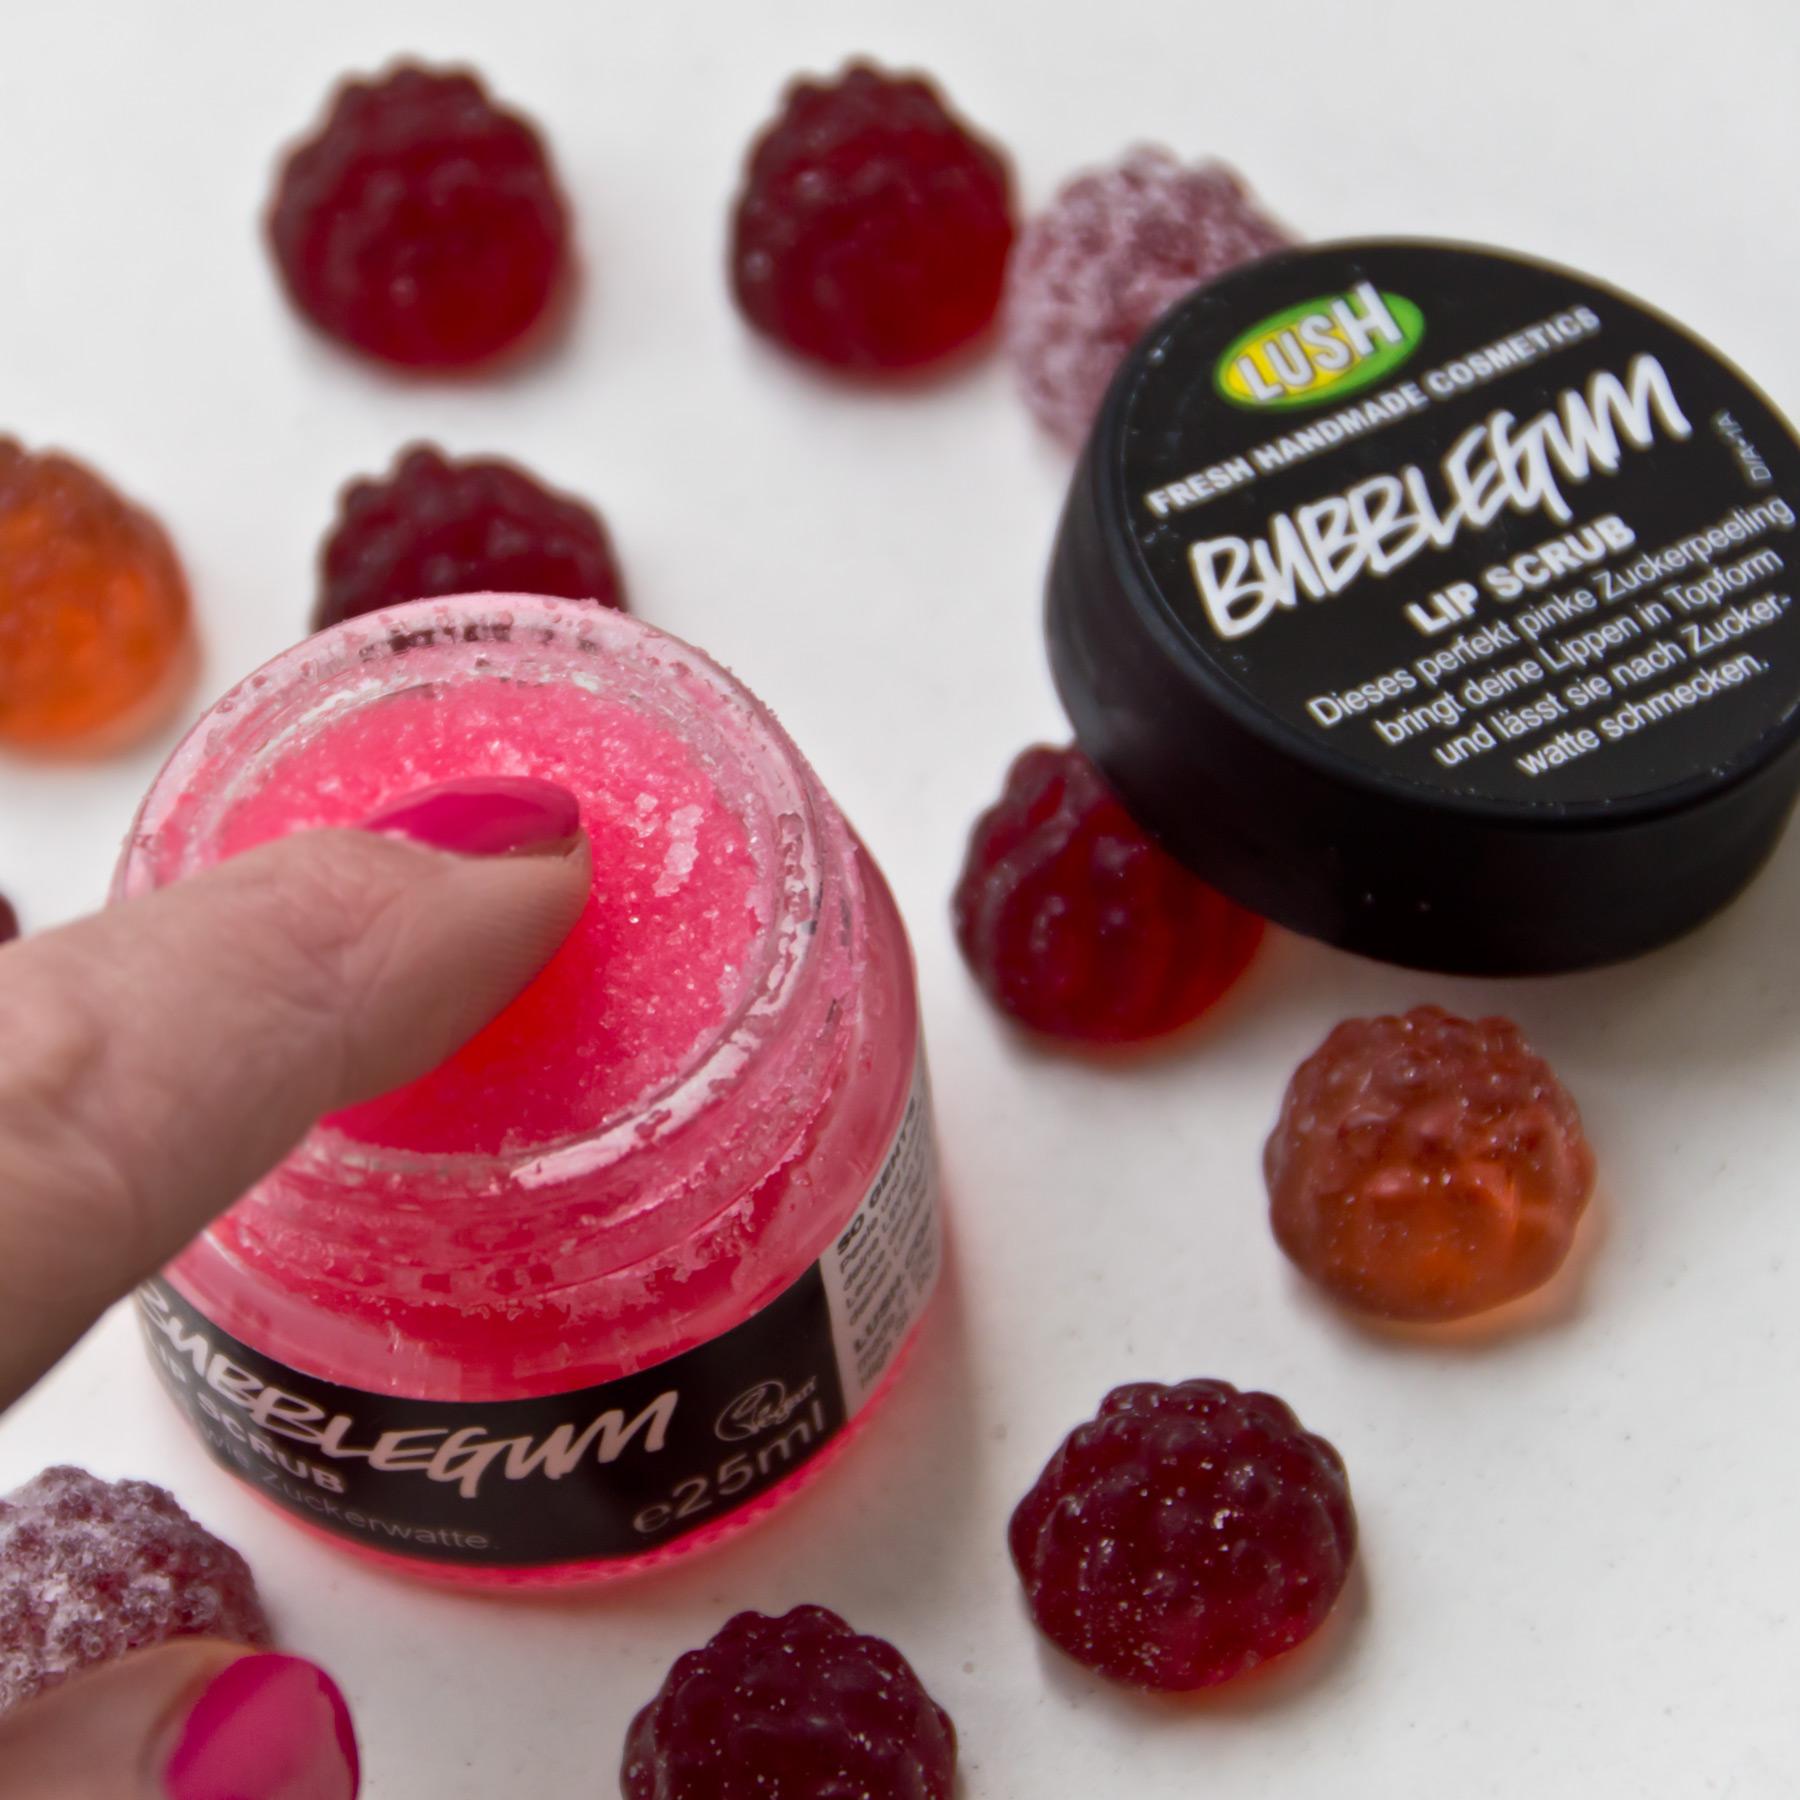 Lush Bubblegum Lip Scrub Marie Theres Schindler Beauty Blog